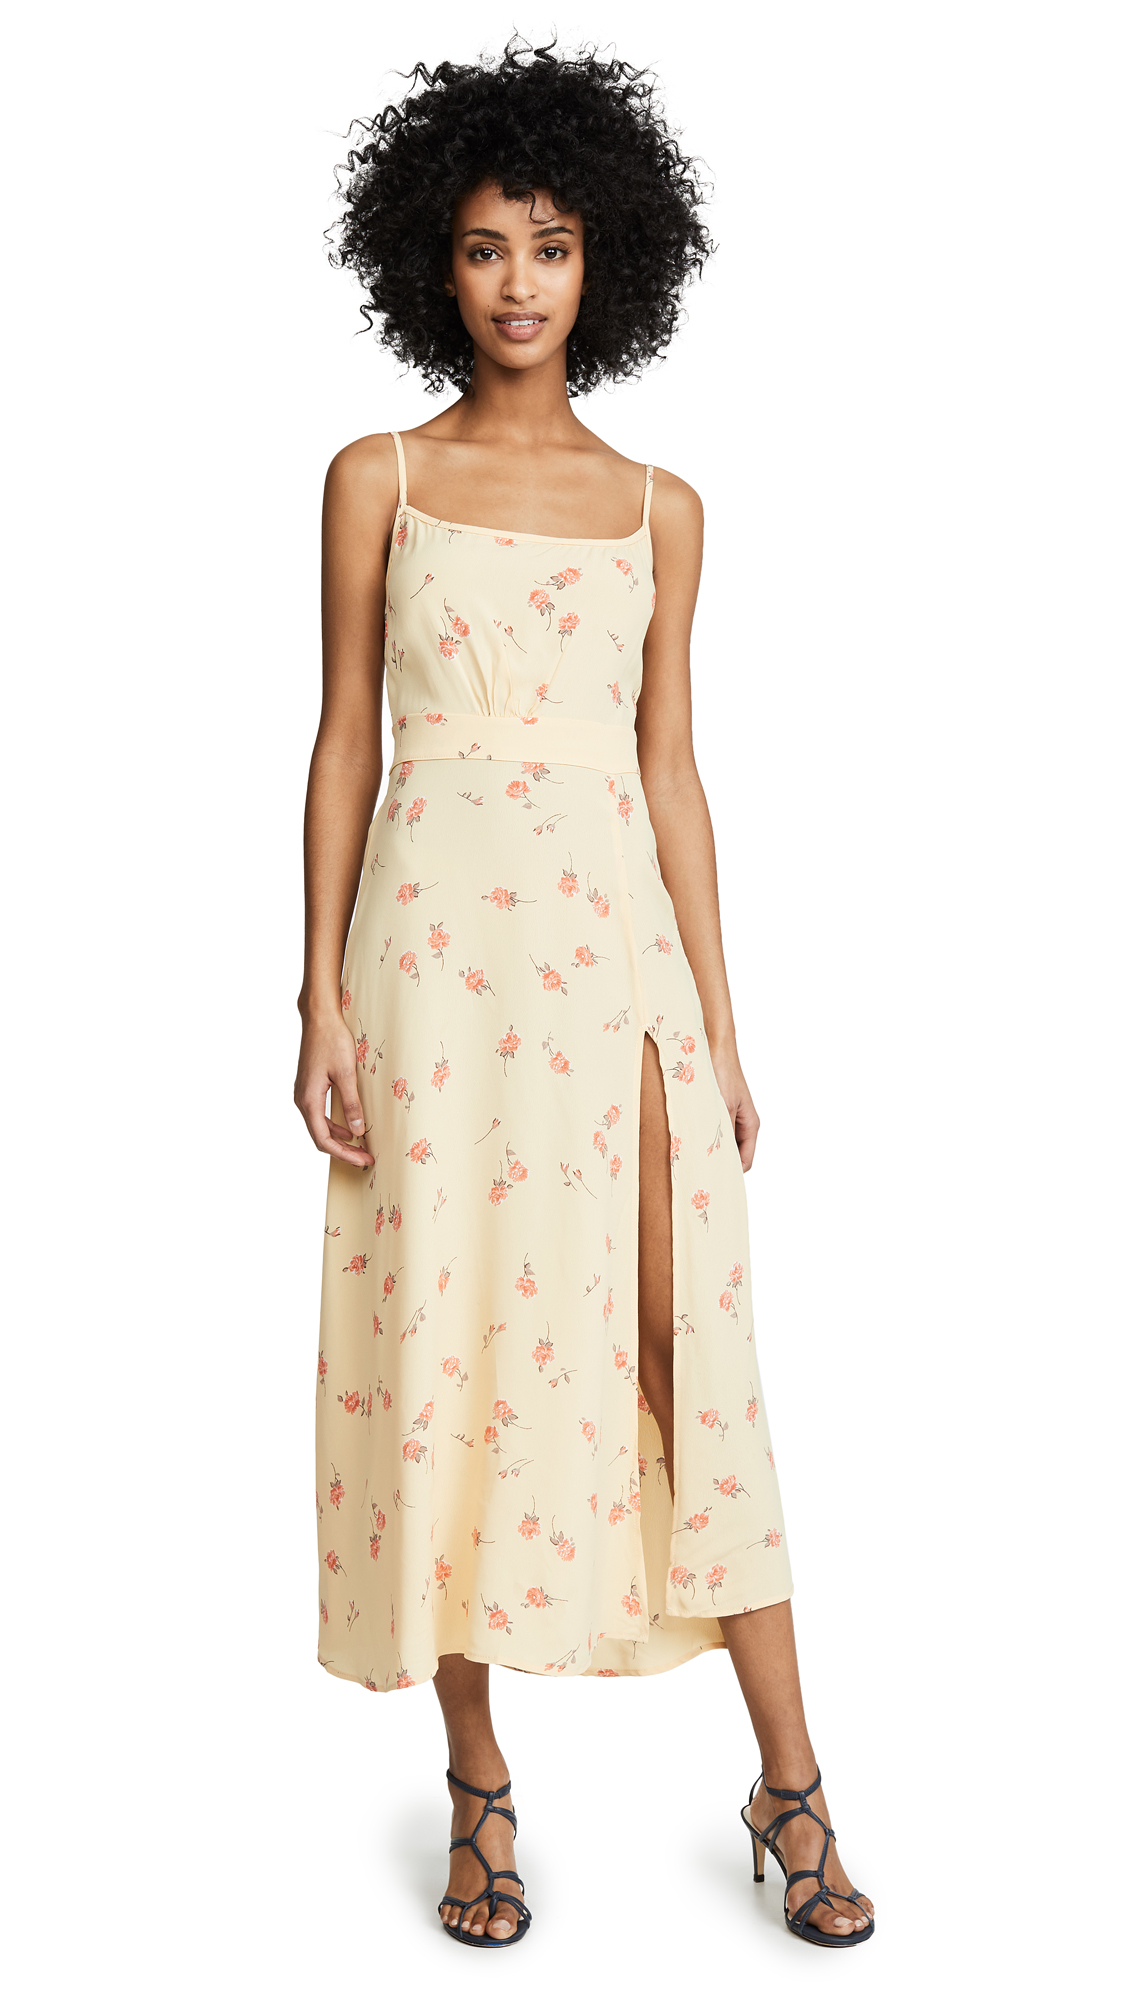 Flynn Skye Hazel Midi Dress - Sunshine Blooms